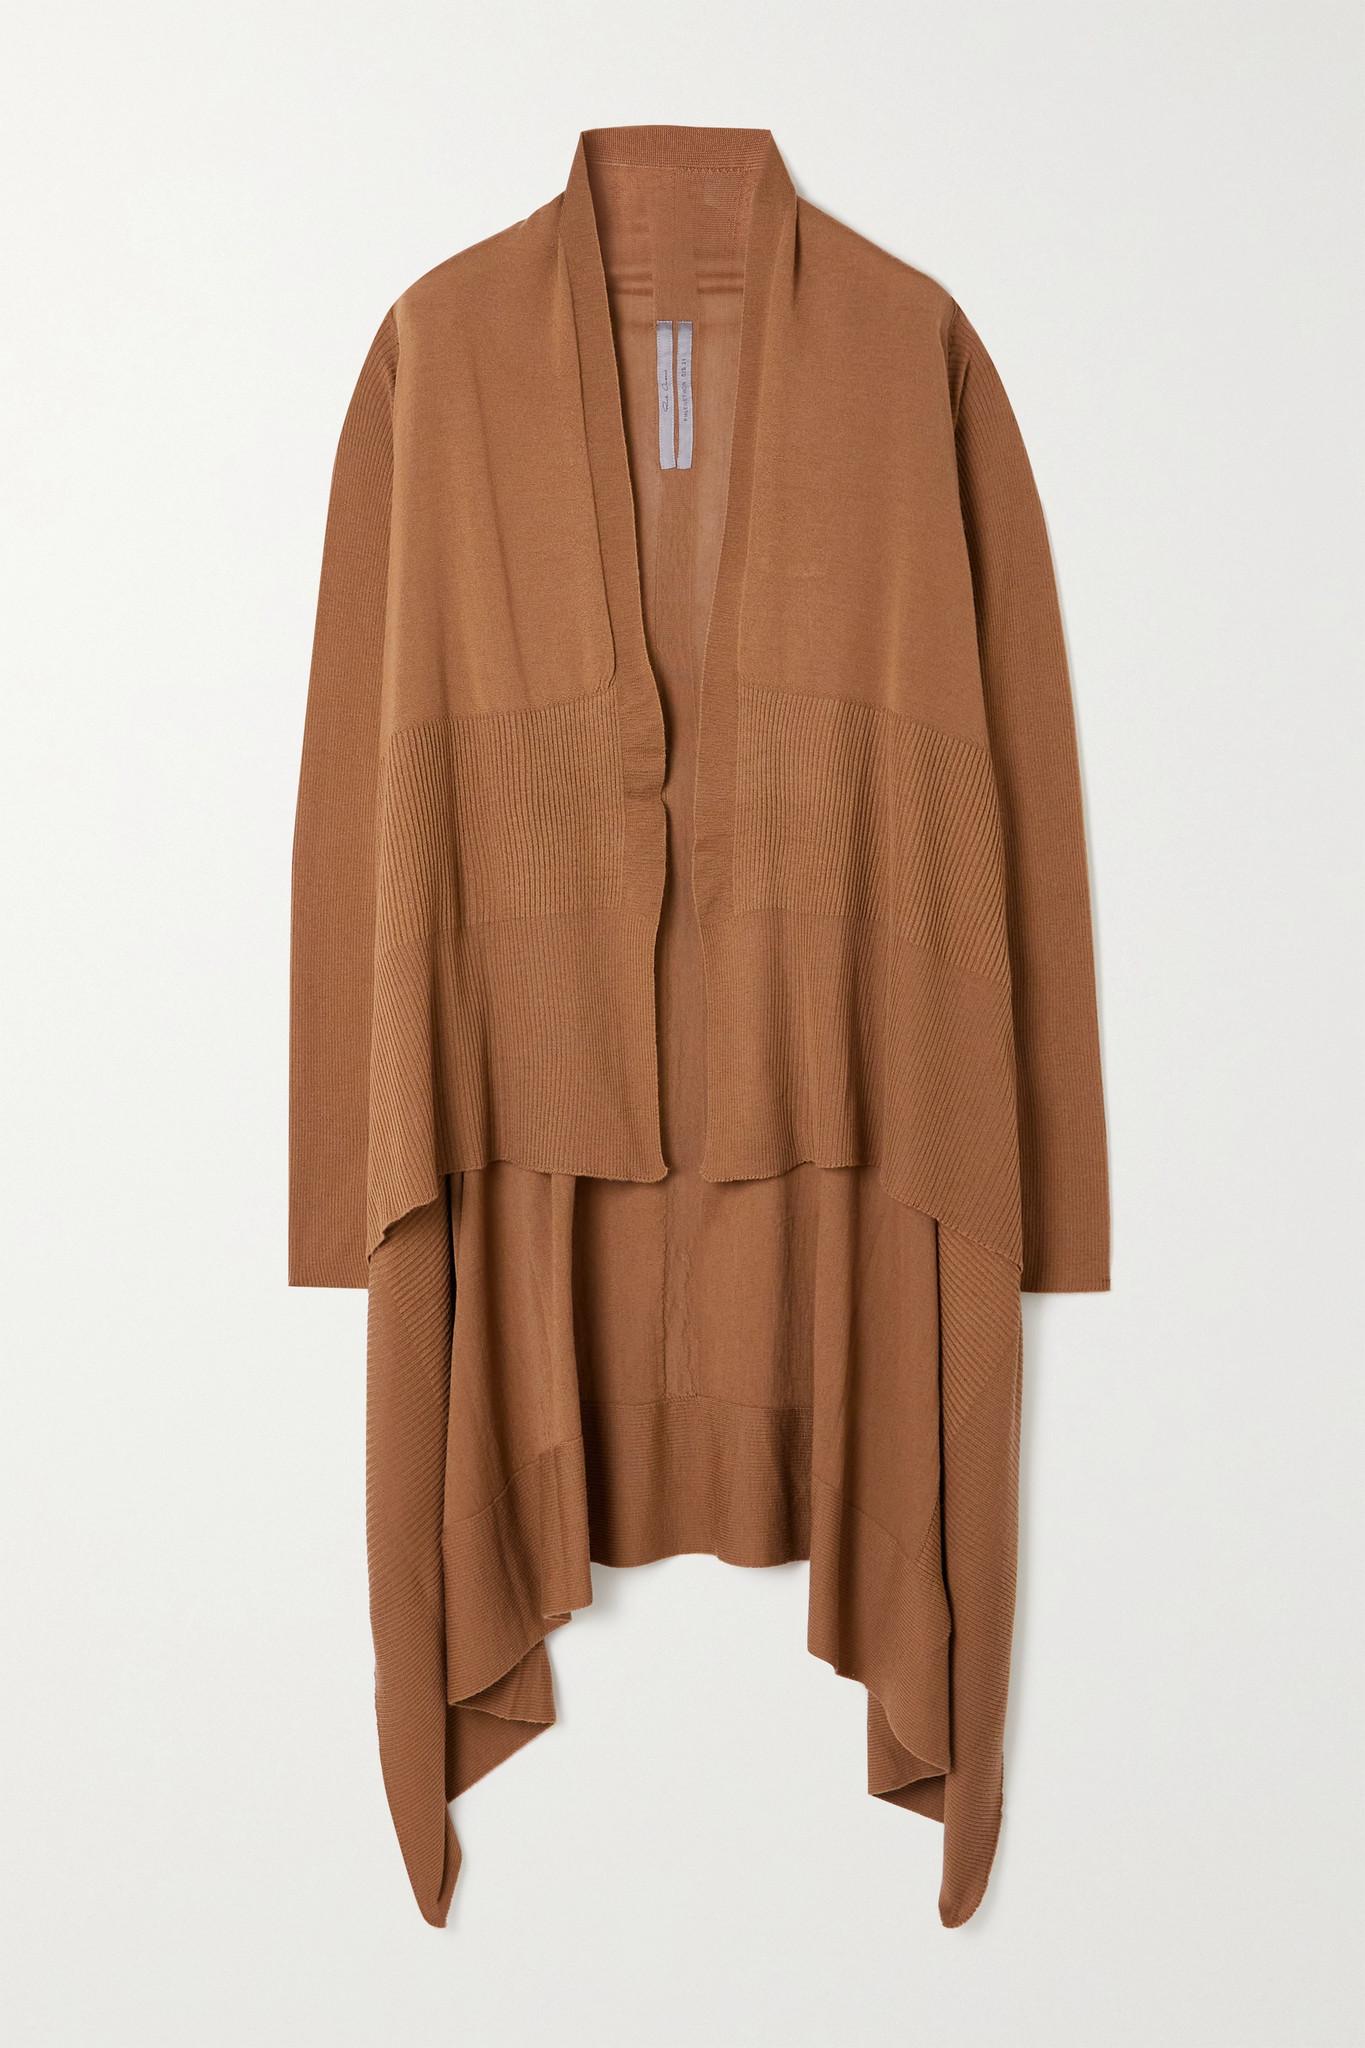 RICK OWENS - Draped Ribbed Wool Cardigan - Brown - large